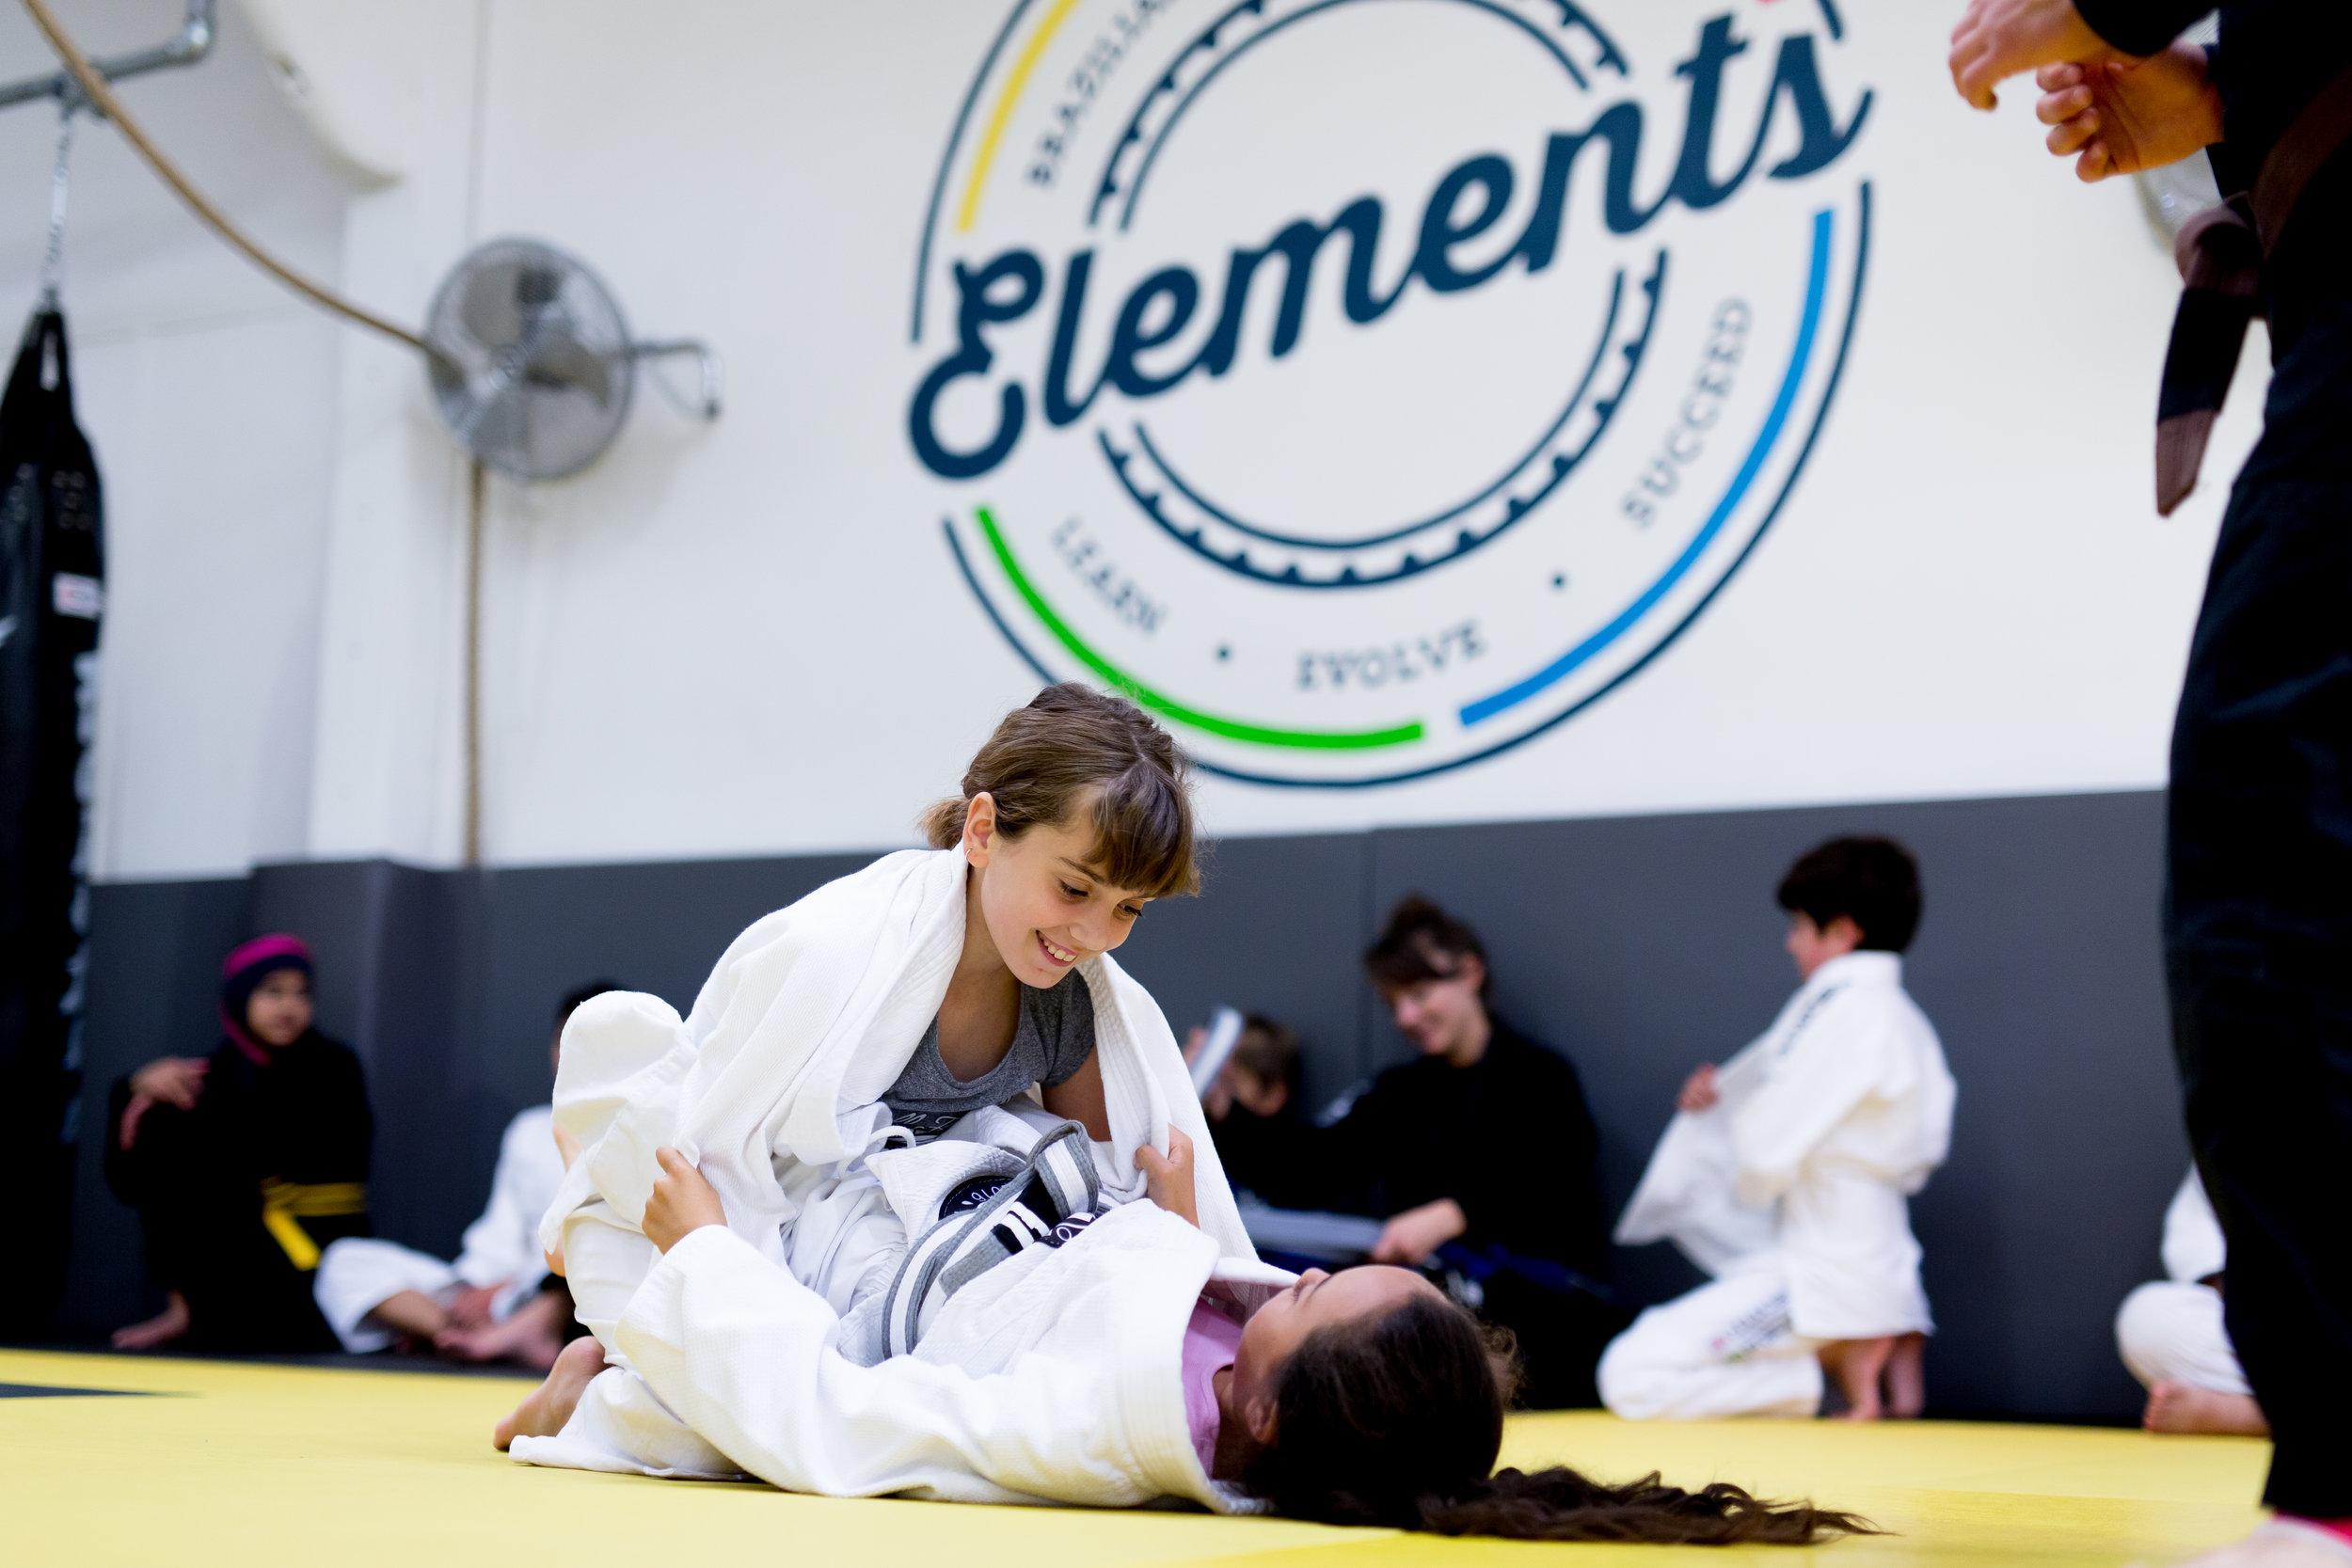 Elements lewes adults martial arts